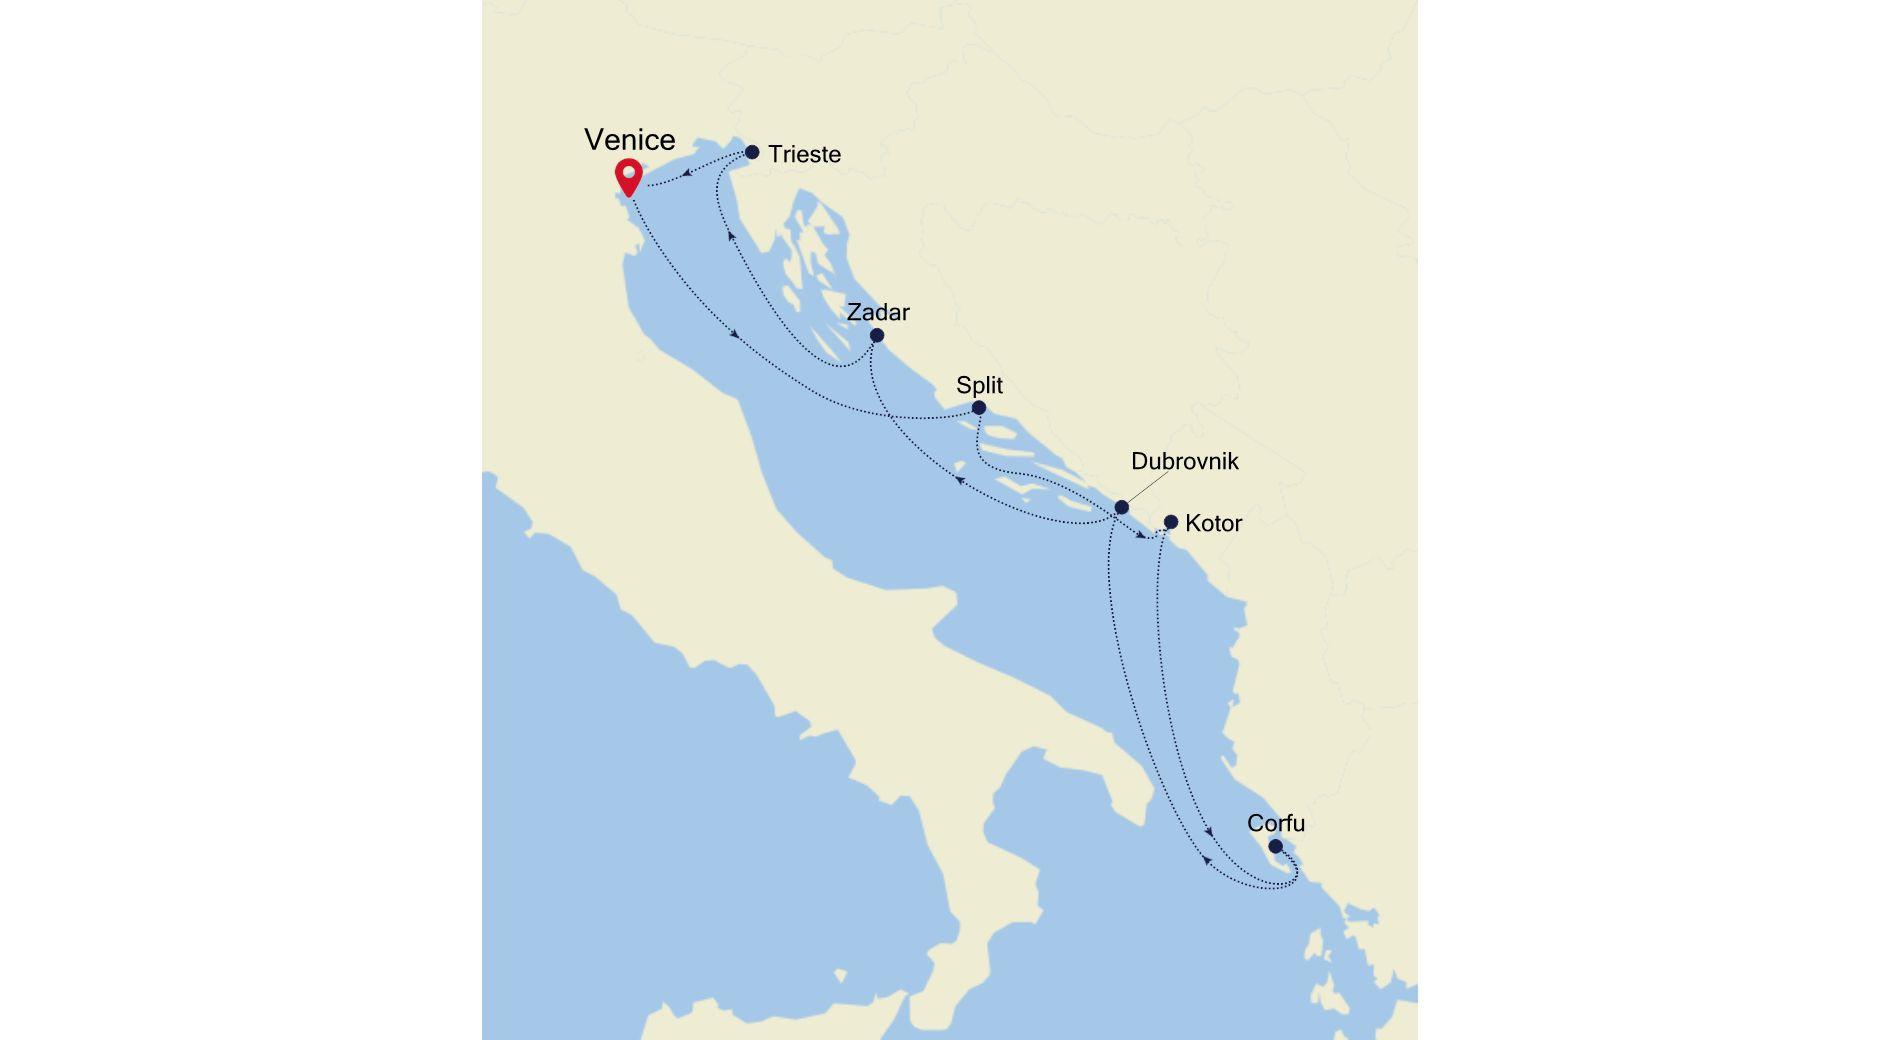 MO210628007 - Venice to Venice